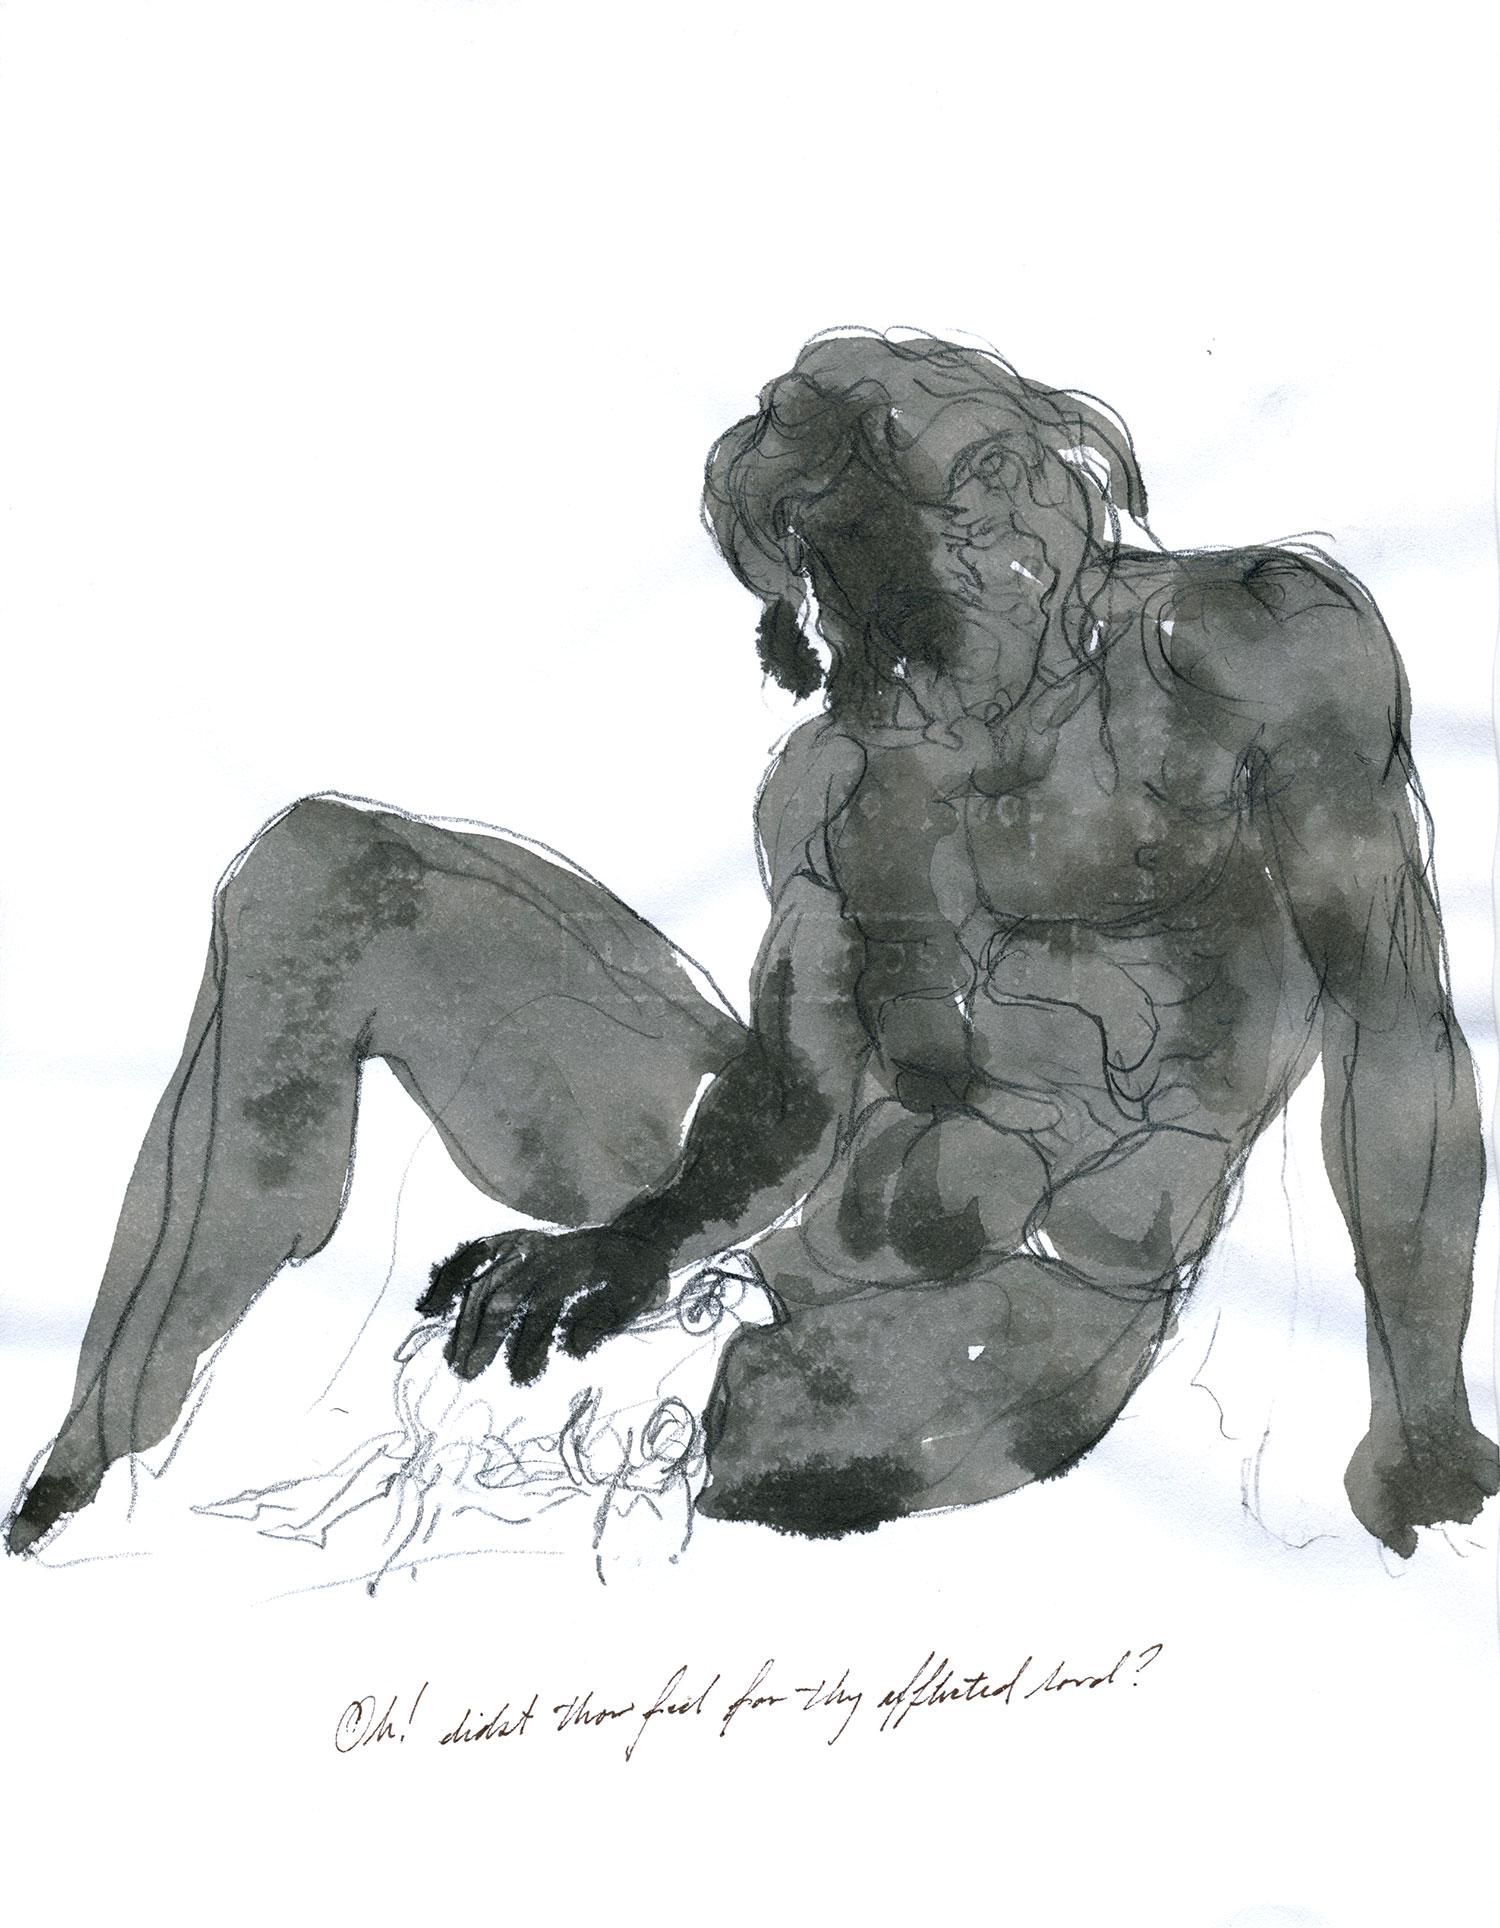 "Polyphemus (Odyssey Book IX)  2015, Ink on paper, 11"" x 8 1/2"" © Leonard Porter MMXV"